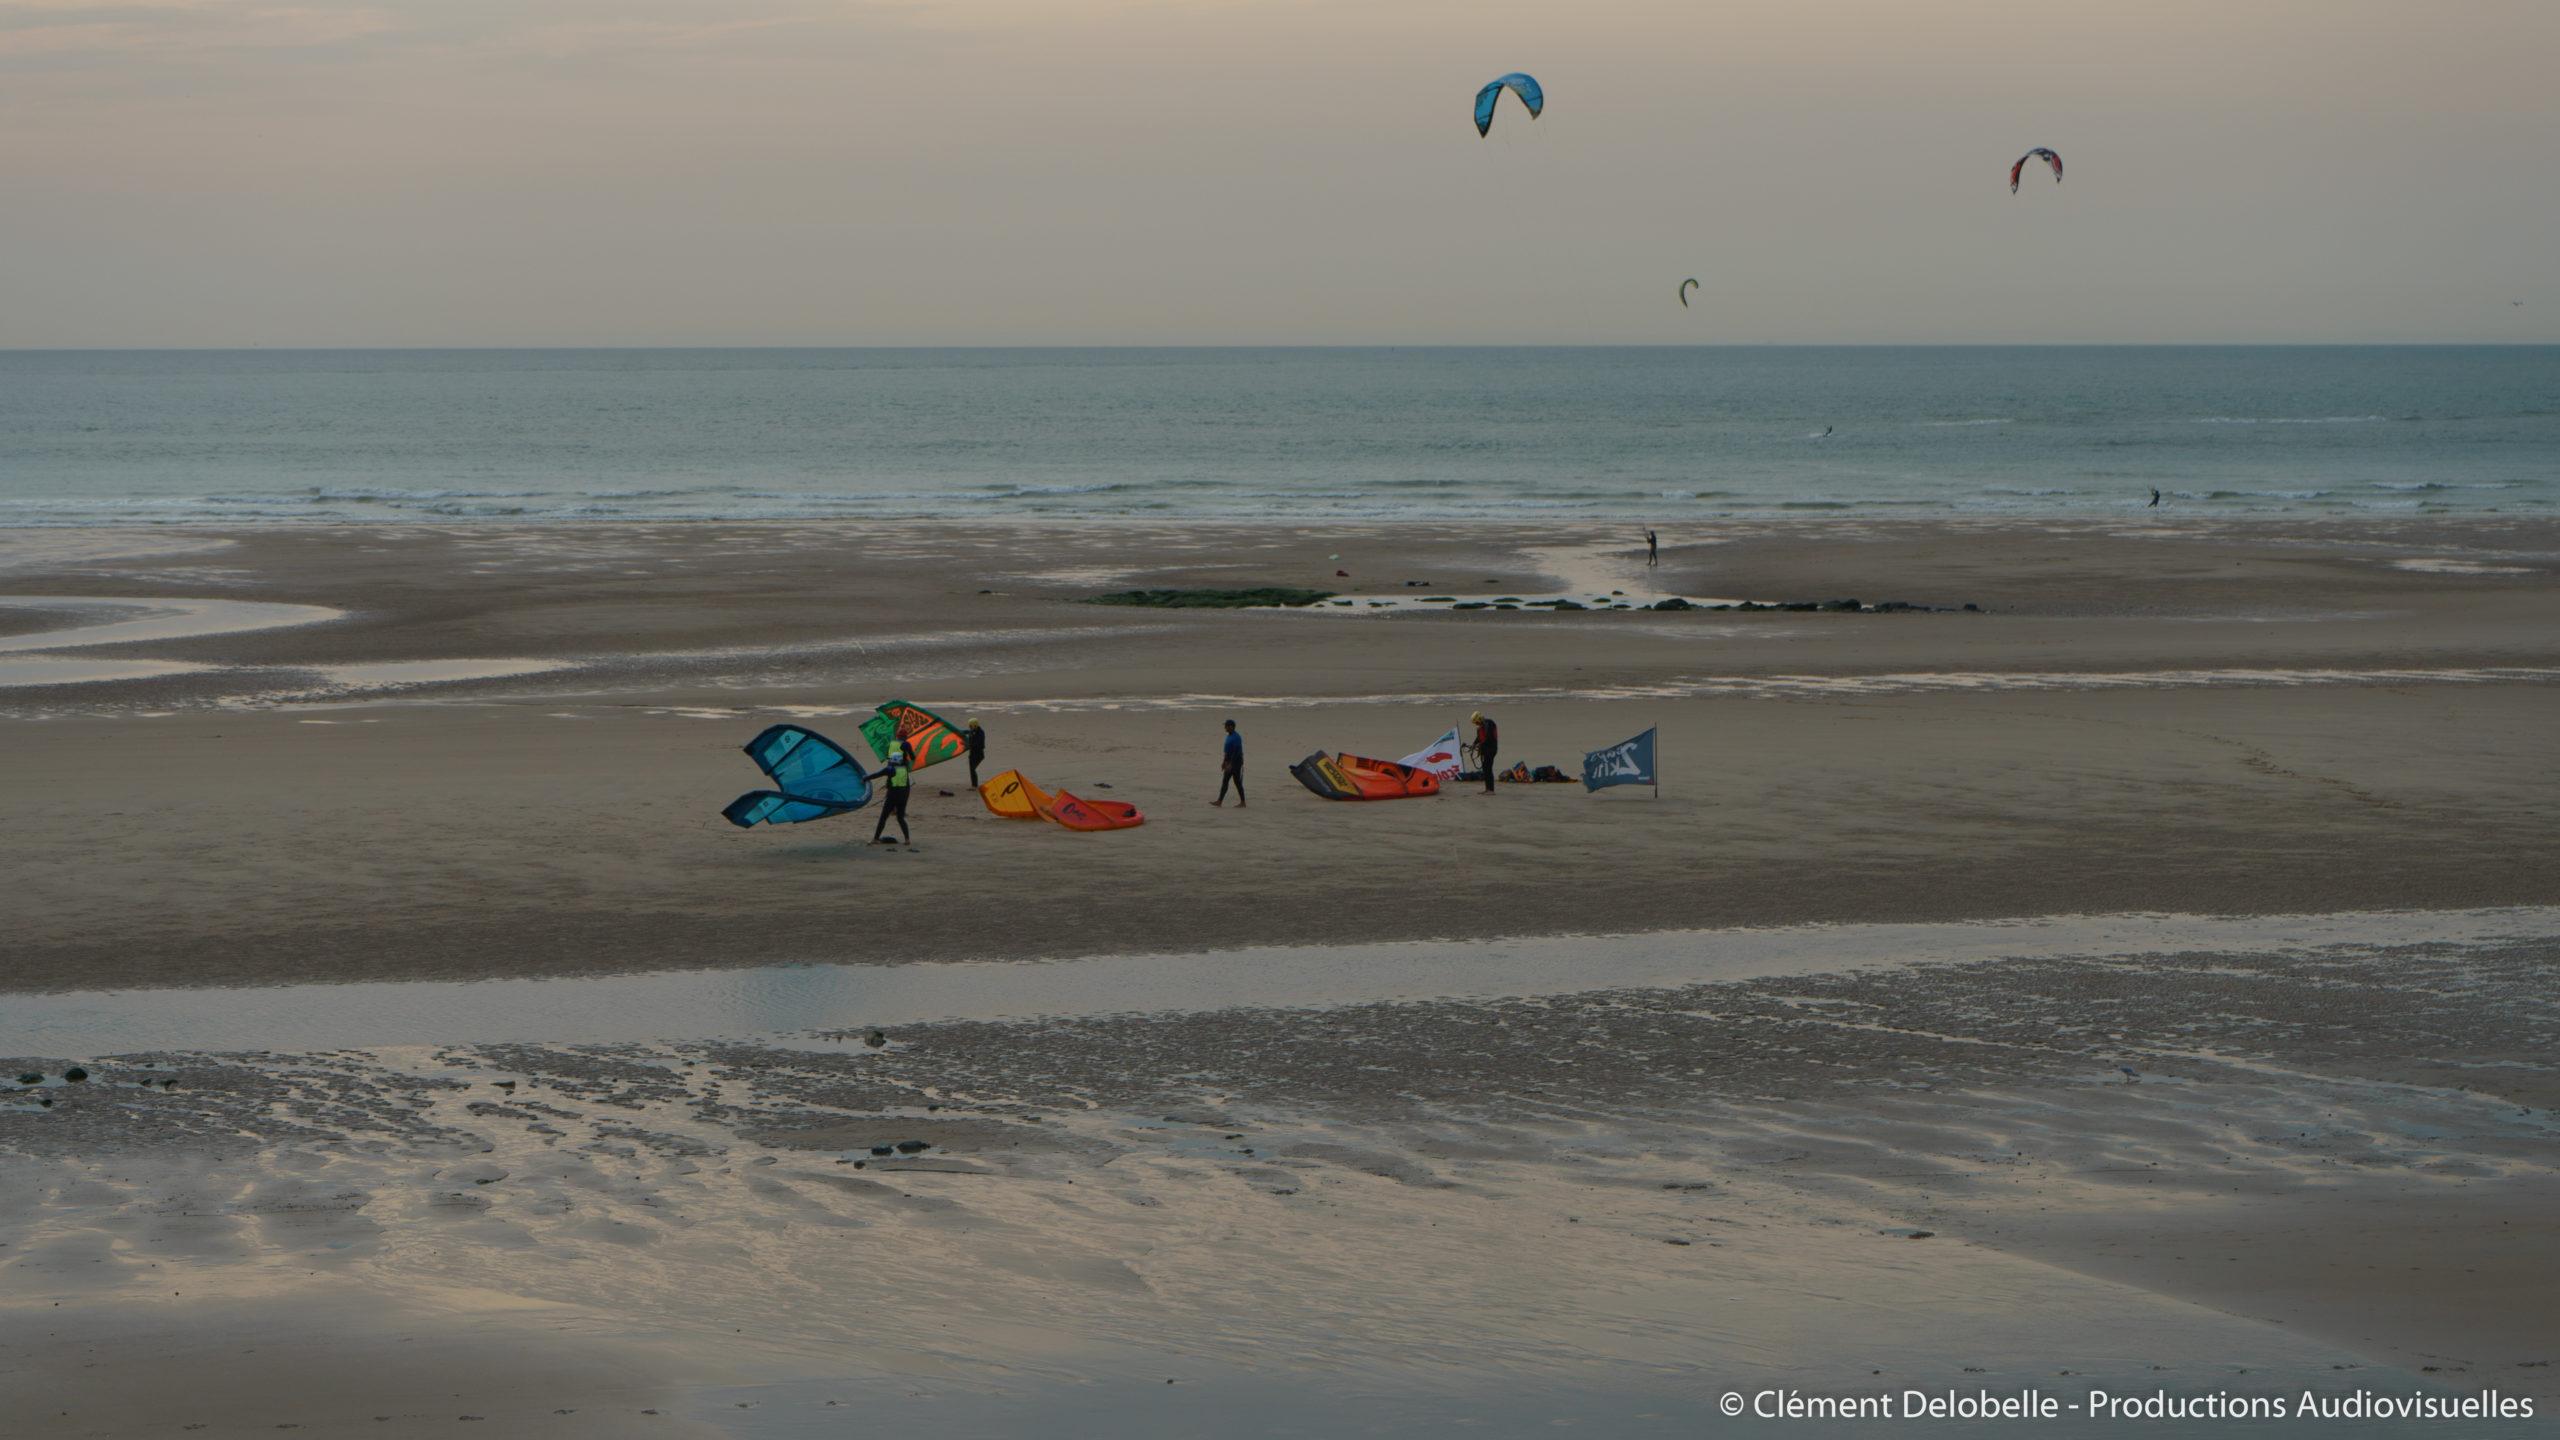 ecole de kitesurf wissant 2capskite